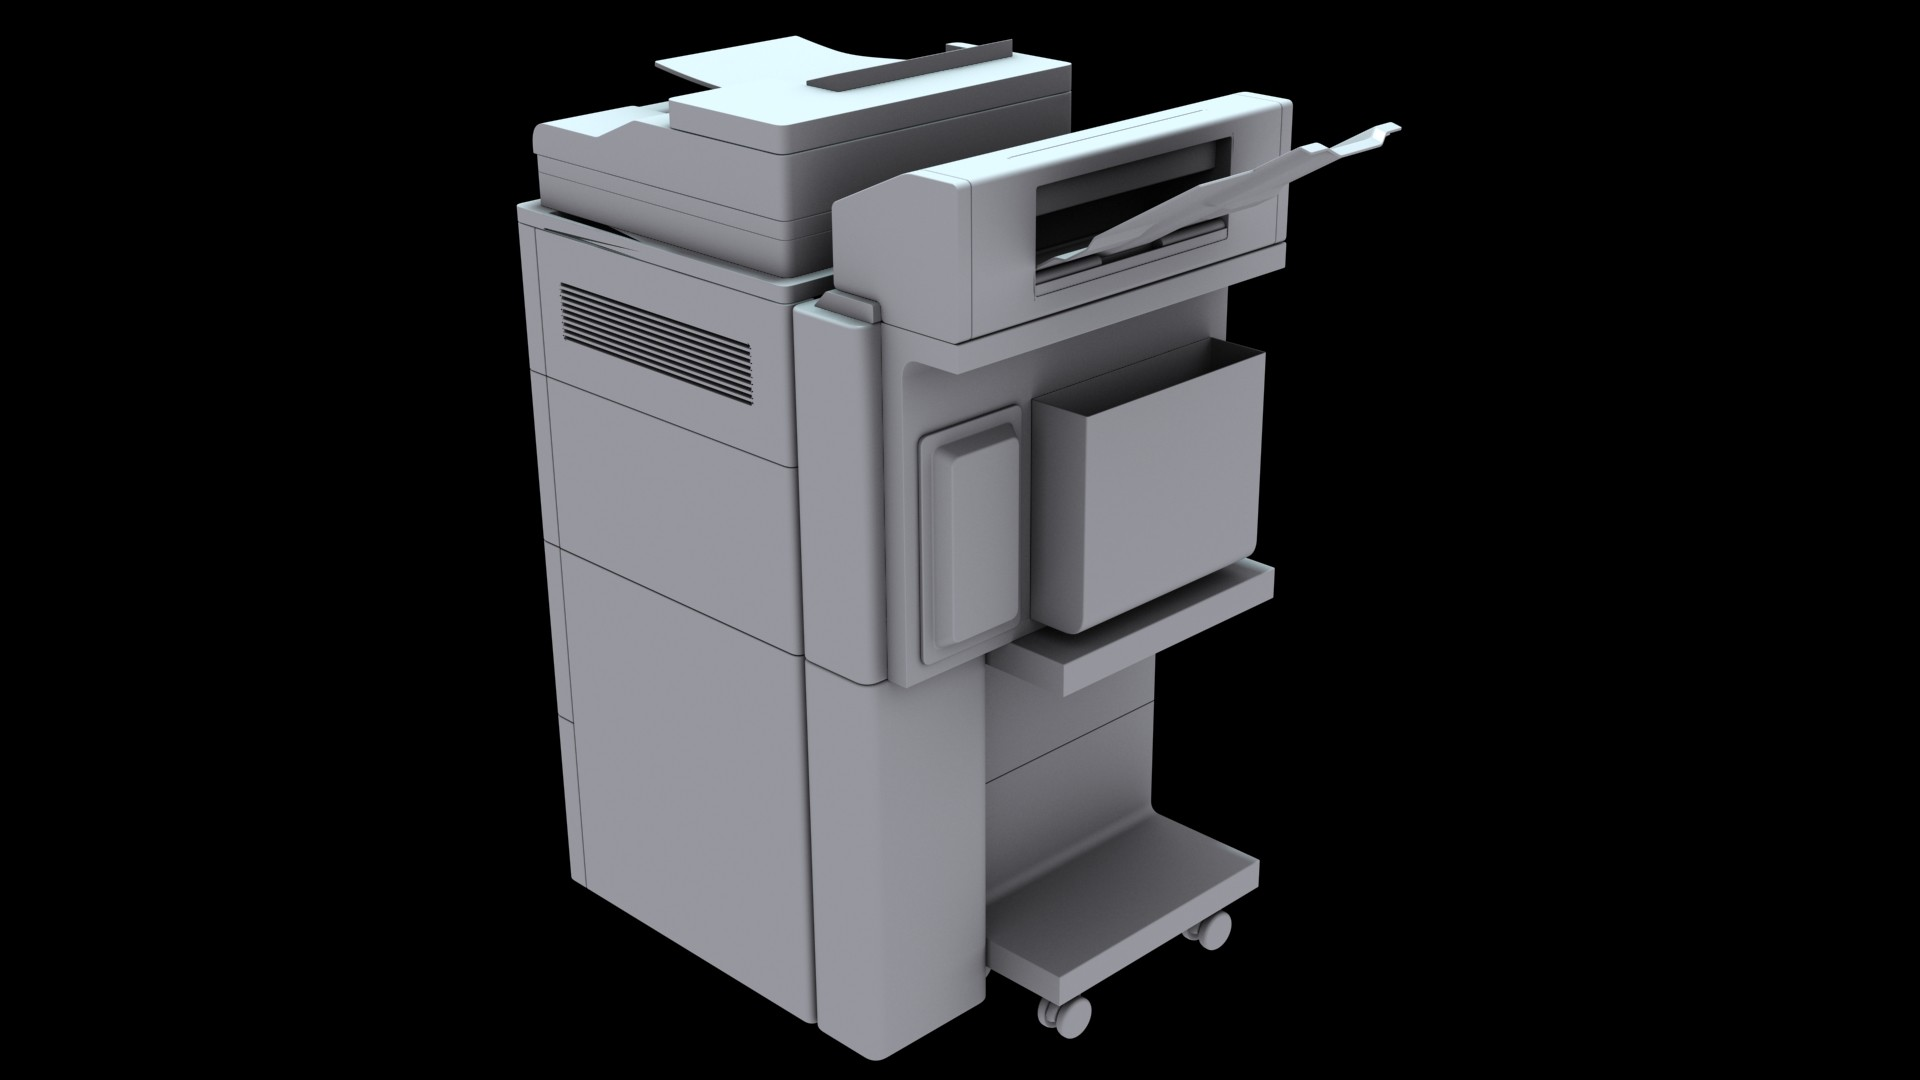 Sergey tabakov photocopier machine 14 hi02